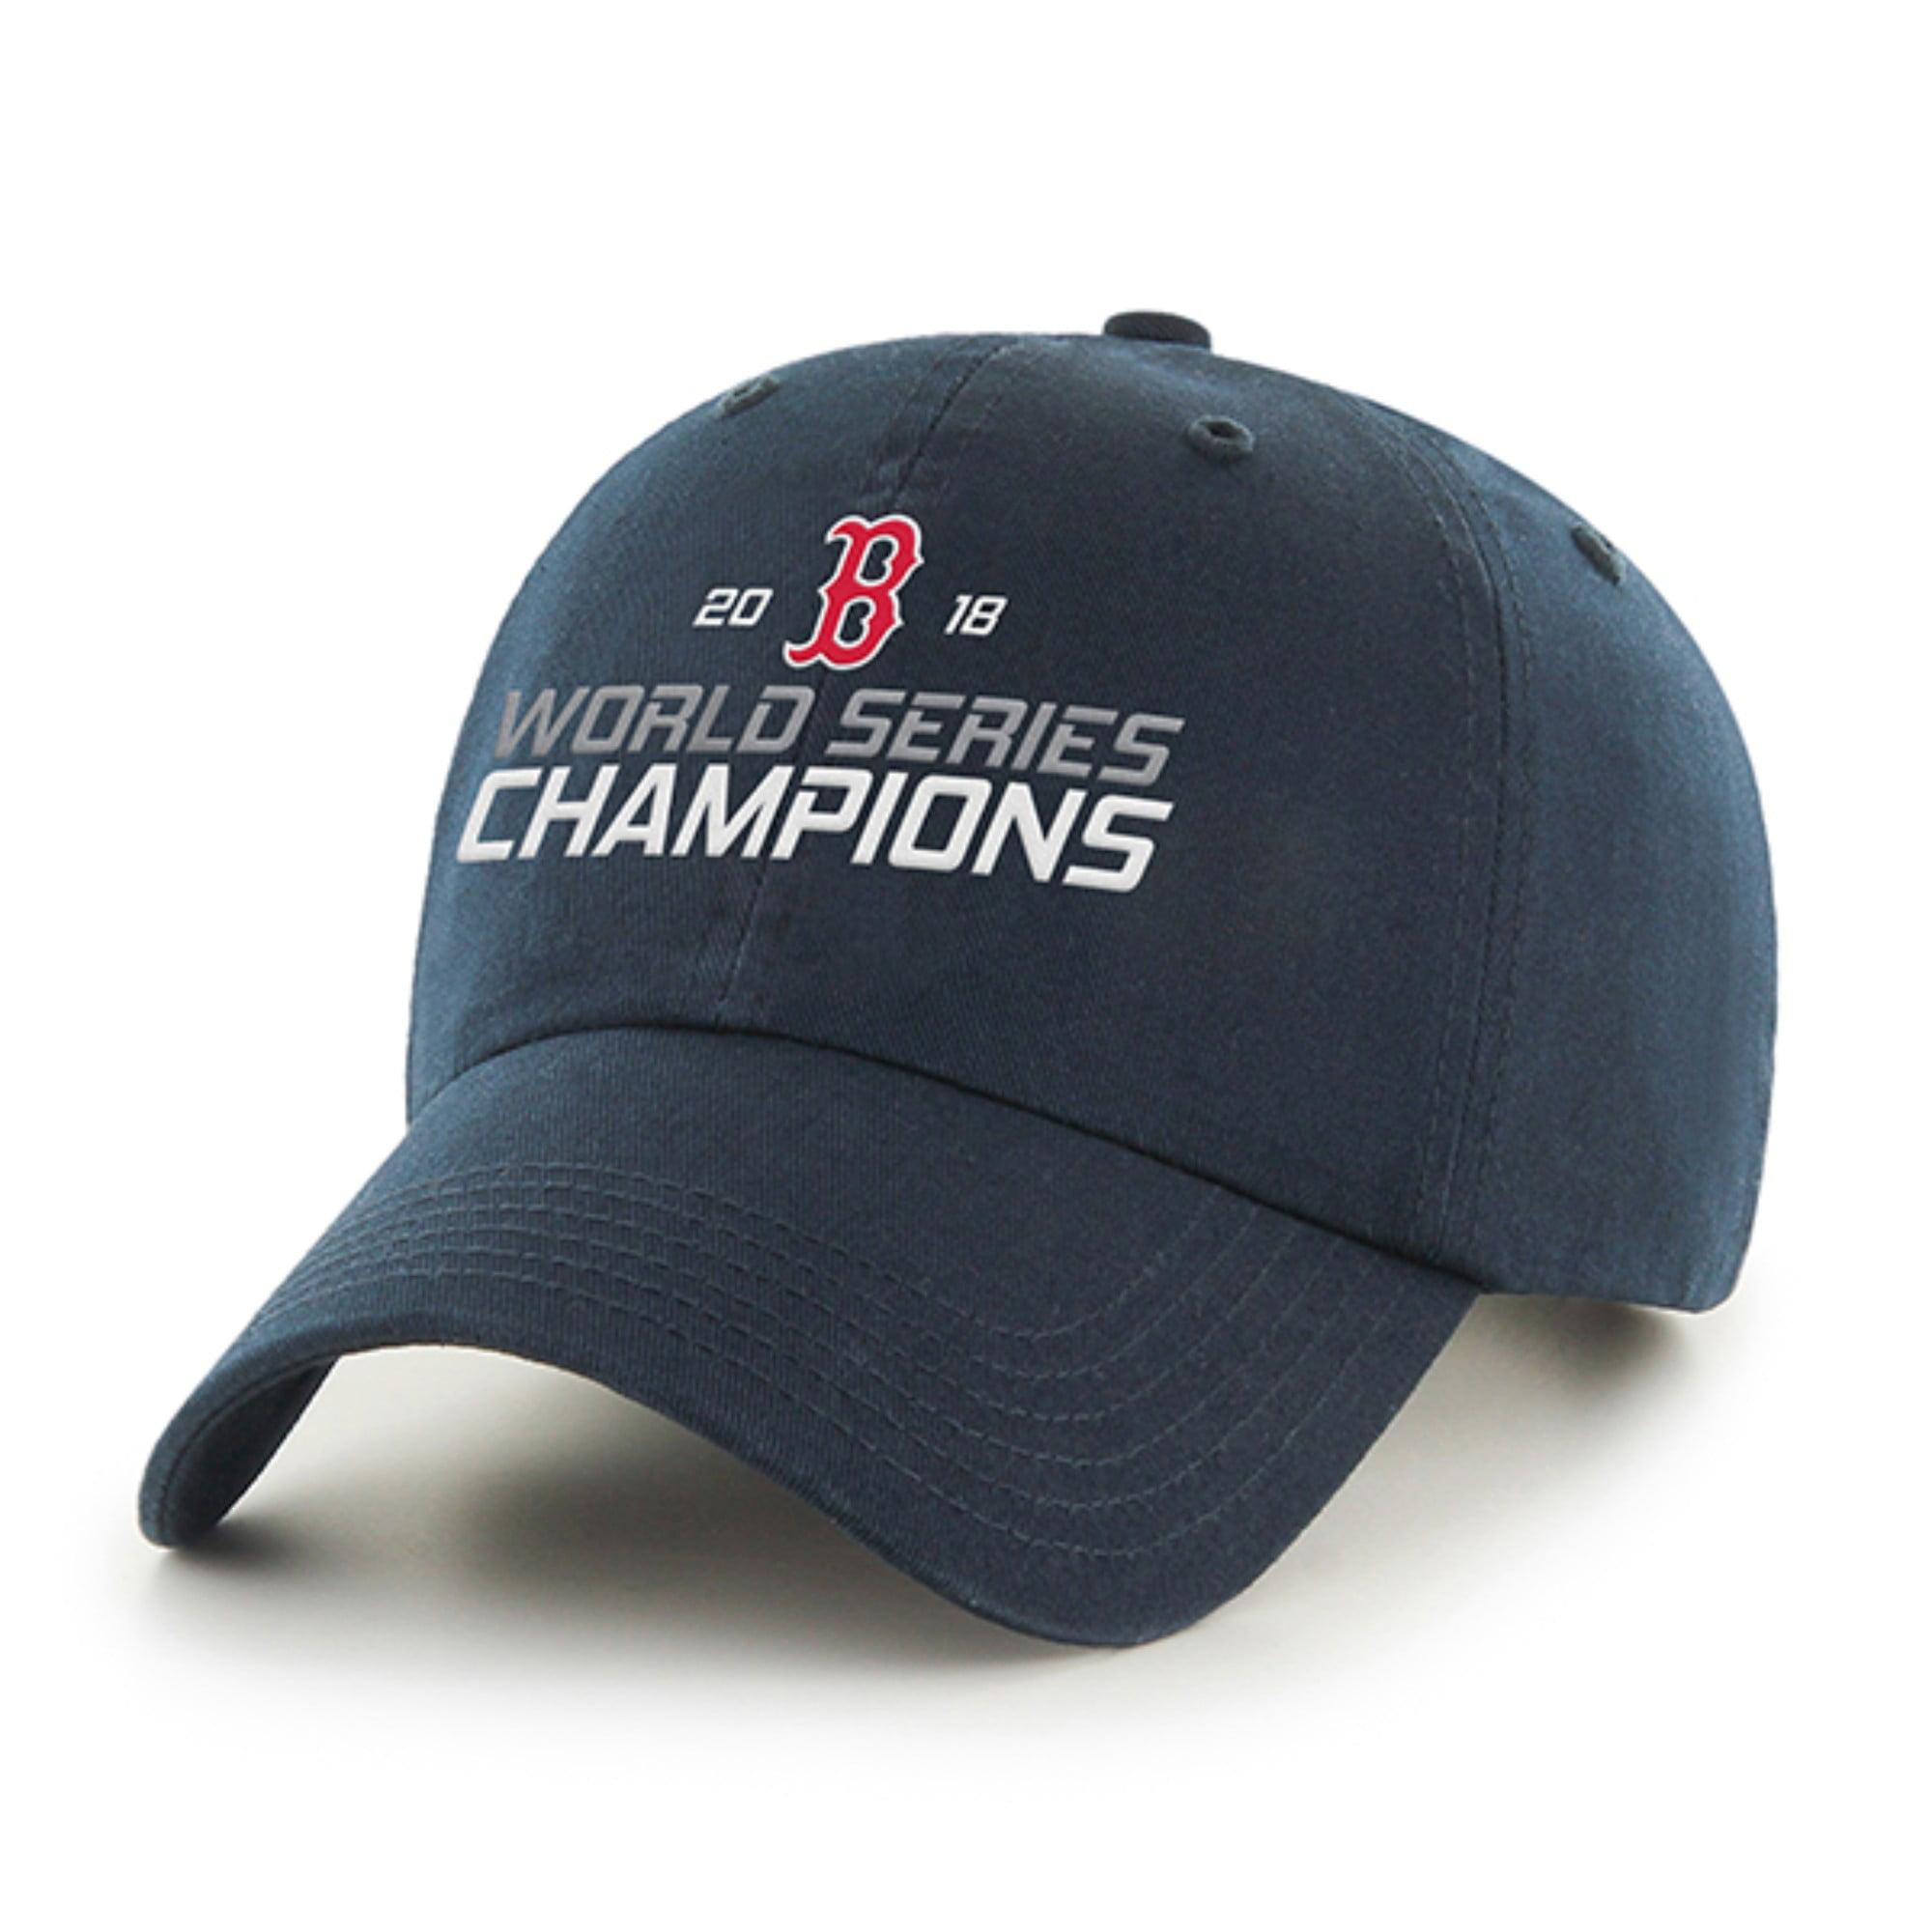 aa094ca877 Fan Favorite MLB World Series Champions Clean Up Hat